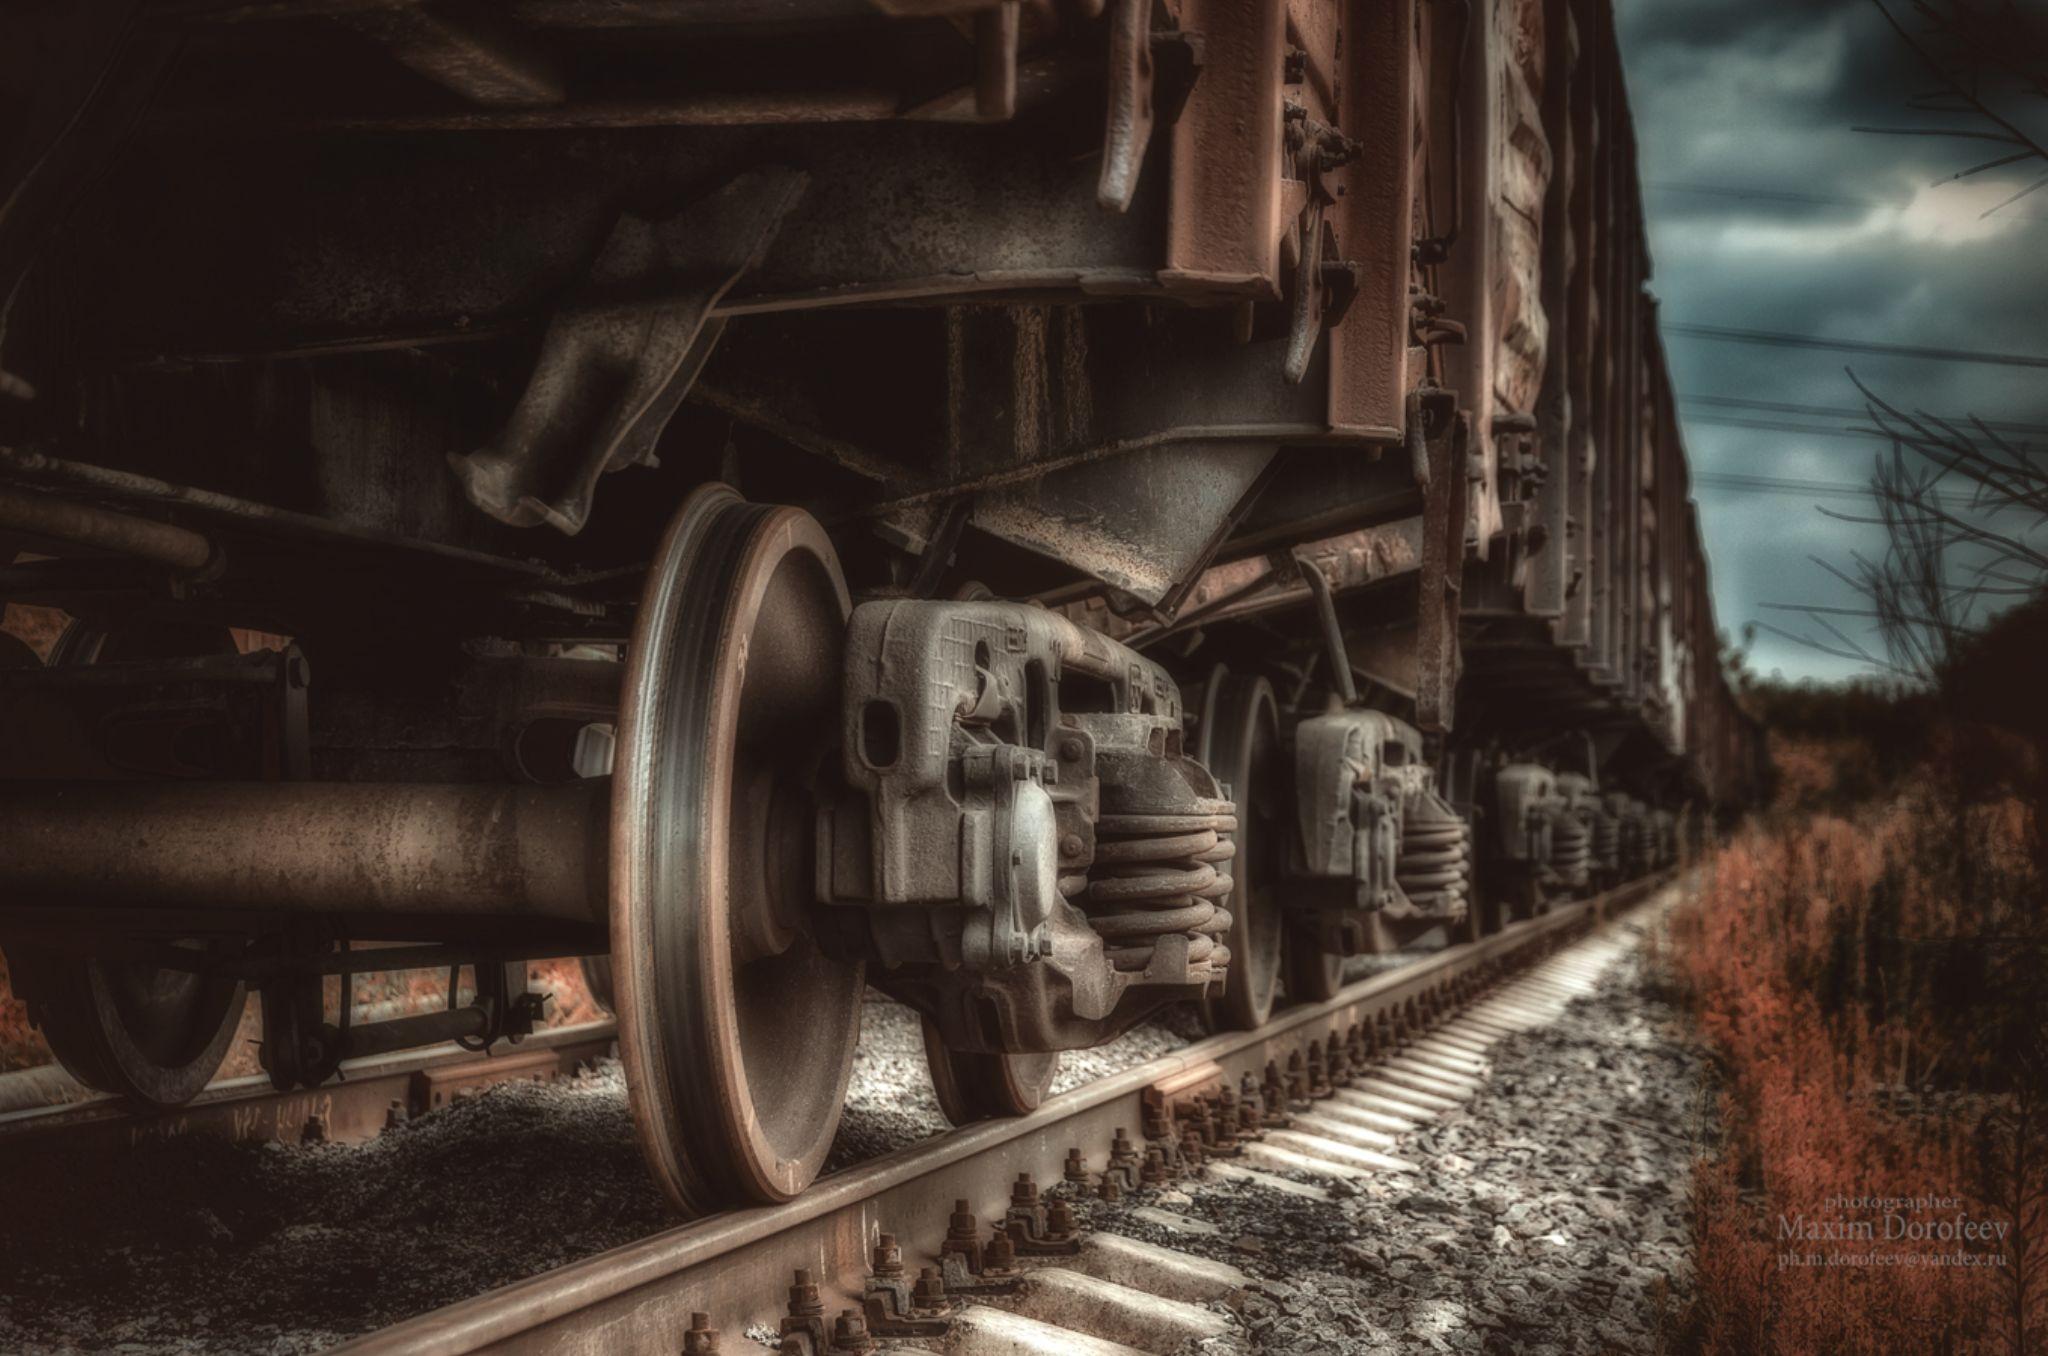 Abandoned railway by Maxim Dorofeev